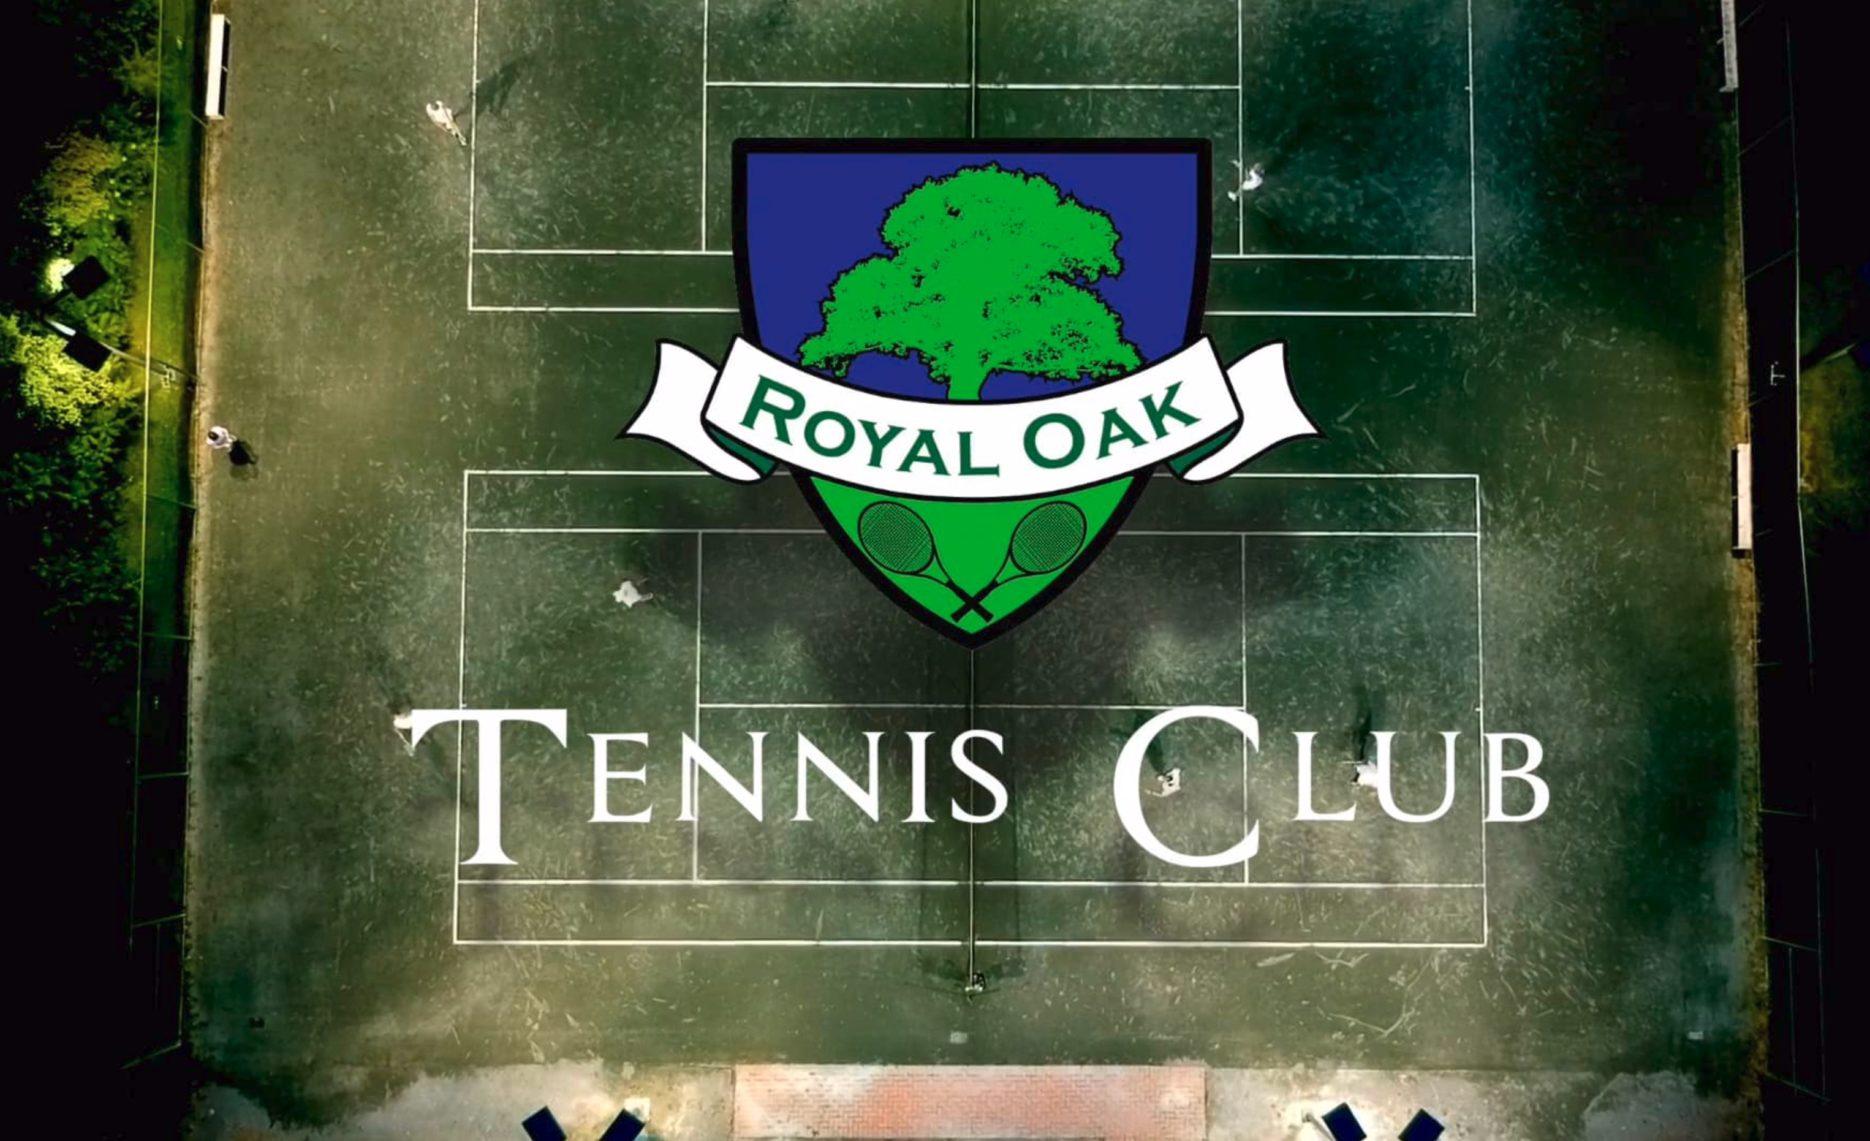 Royal Oak Tennis Club